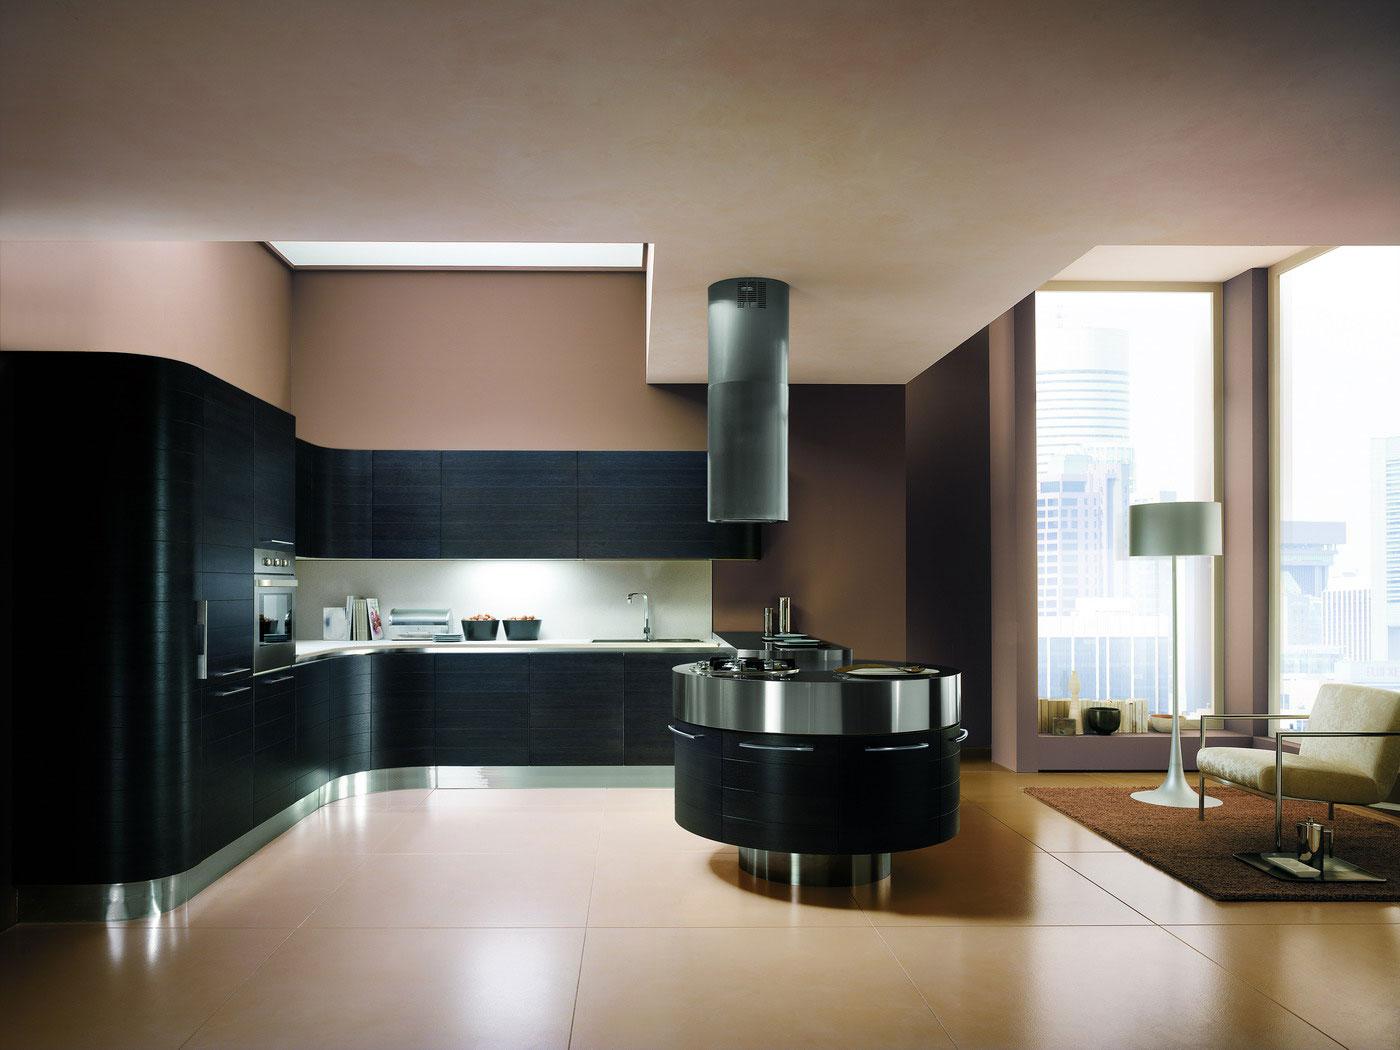 Cuisine Luxe cuisine luxe vente cuisine complete   cuisines francois